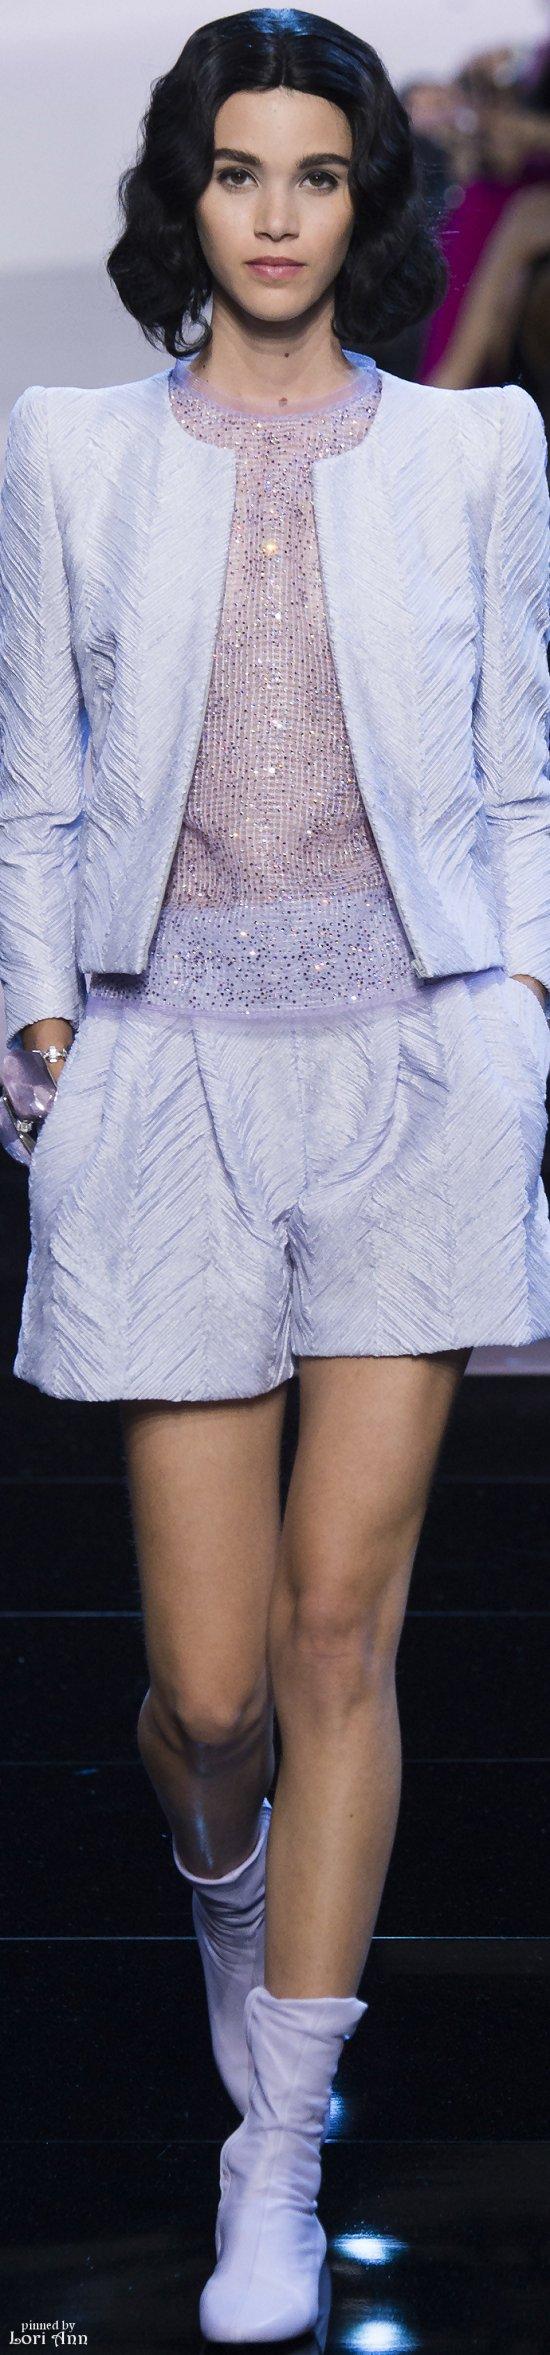 Armani Privé Couture Spring 2016 | ARMANI 2014-15-16 ...